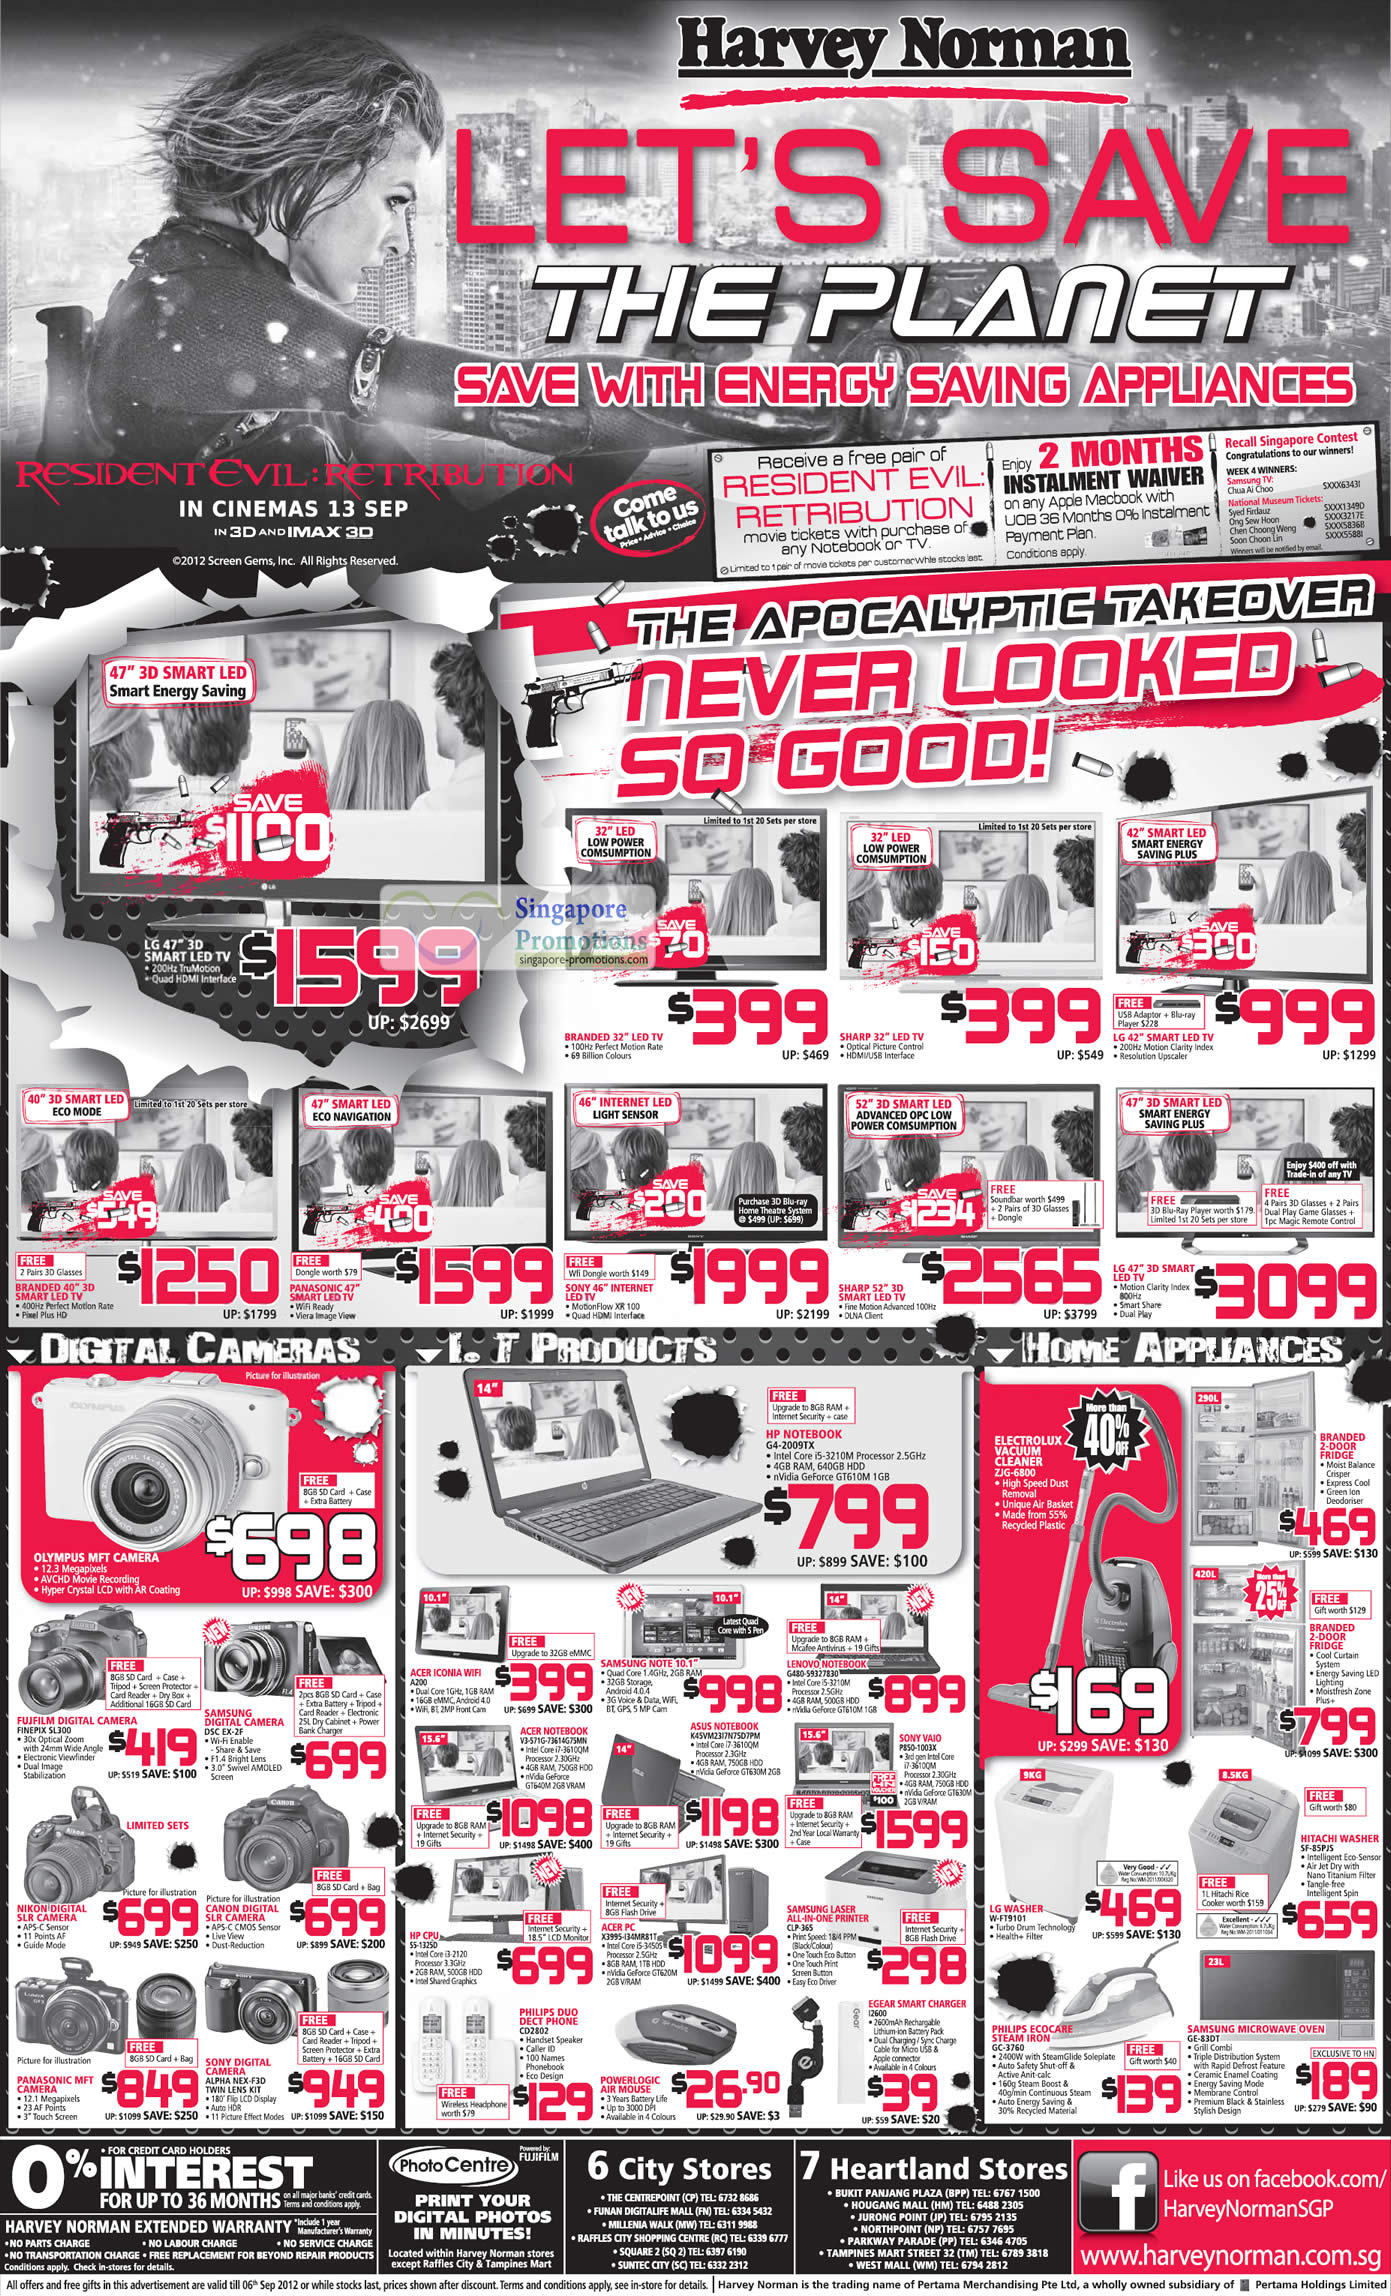 SAMSUNG Digital Camera EX-2F, FUJFILM Digital Camera FINEPIX SL300, SONY ALPHA NEX-F3D DSLR Digital Camera, HP Notebook G4-2009TX, LENOVO Notebook G480-59327830, ASUS Notebook K45VM2317N75D7PM, ACER Notebook V3-571G-73614G75MN, ACER ICONIA A200, SAMSUNG LASER Printer CLP-365, ACER Desktop PC X3995-I34MR81T, PHILIPS DDECT PHONE CD2802, EGEAR SMART CHARGER I2600, SONY VAIO P850-1003X Notebook, Electrolux Vacuum Cleaner ZJG-6800, HITACHI Washer SF-85PJS, LG Washer W-FT9101, PHILIPS ECOCARE STEAM IRON GC-3760, SAMSUNG MICROWAVE OVEN GE-83DT